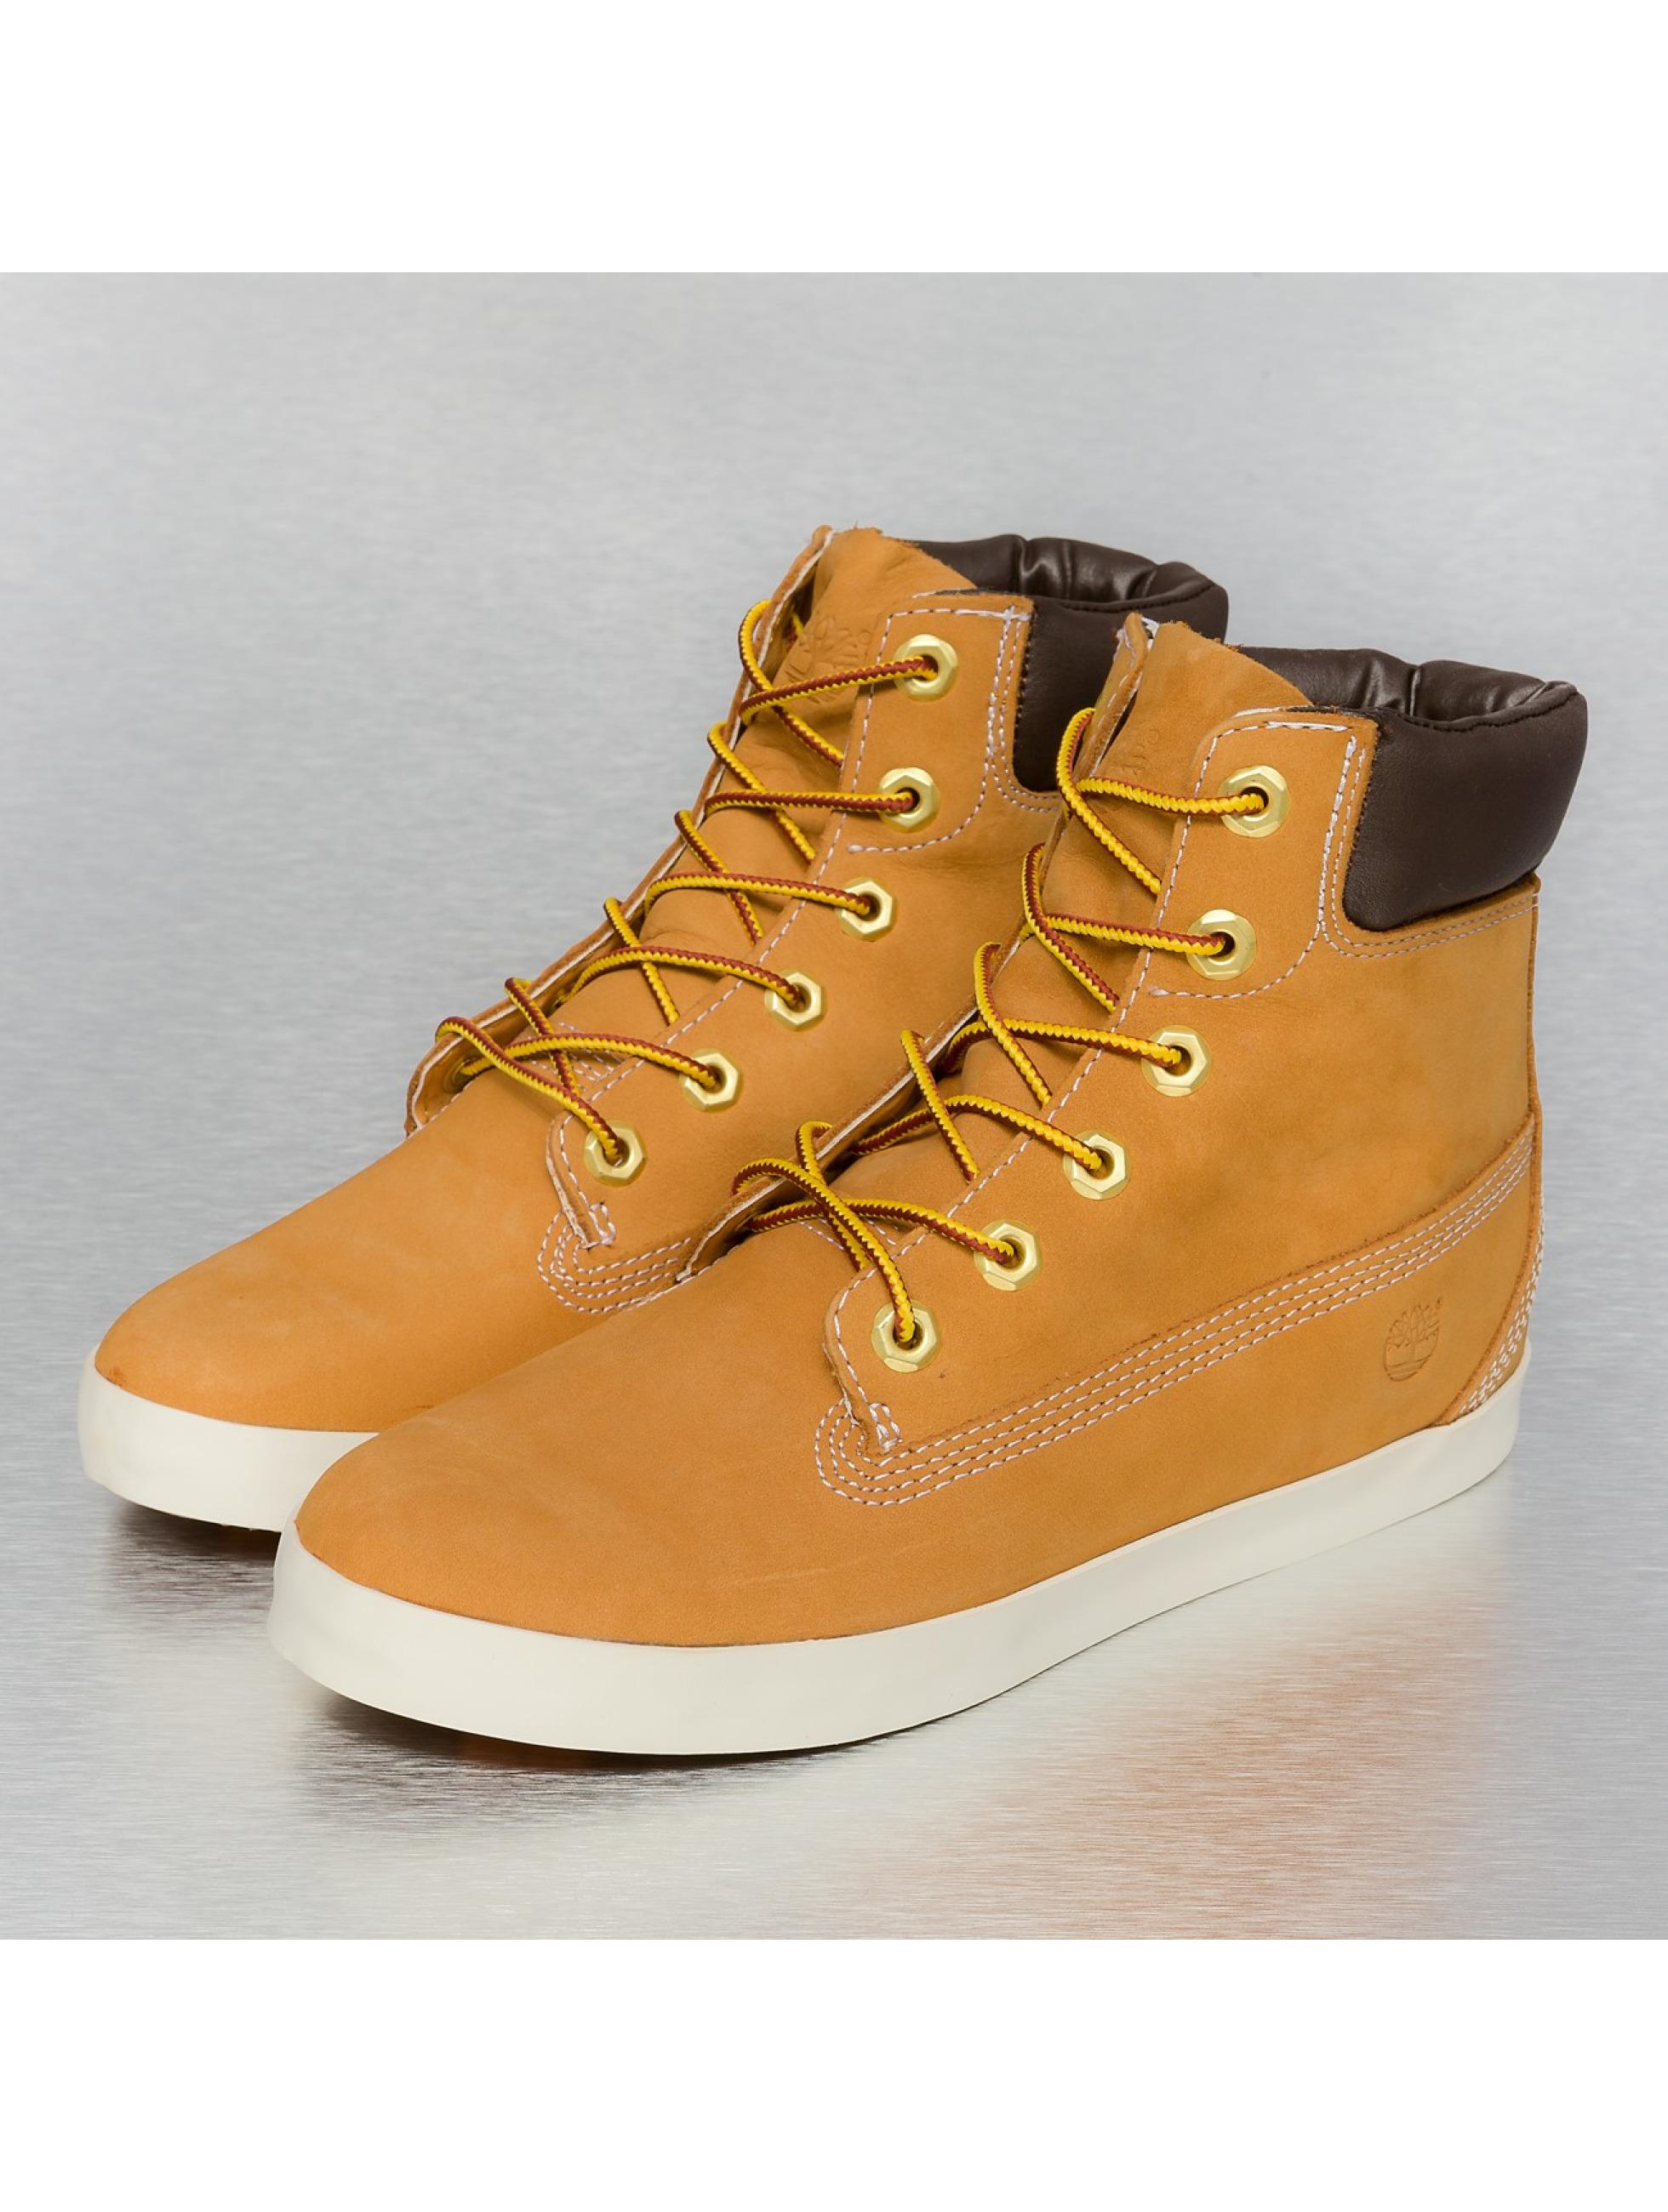 Timberland Boots High Waisted